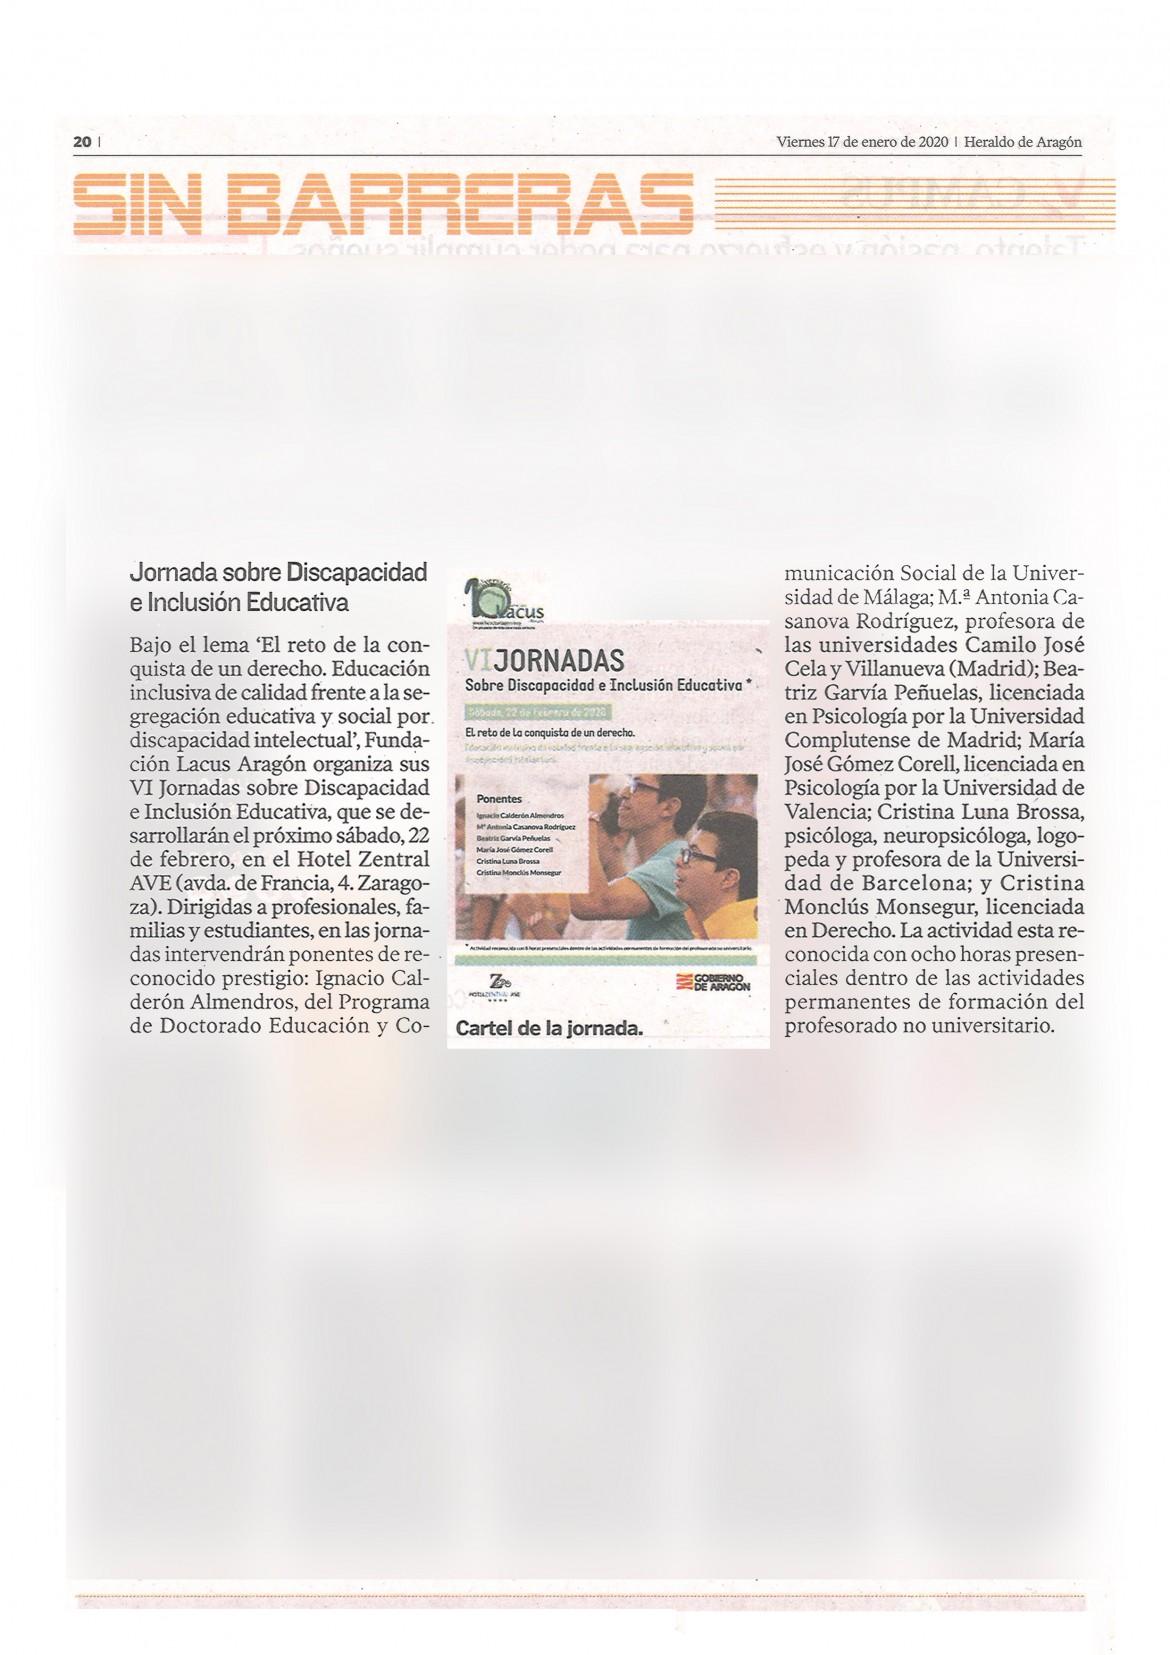 Heraldo de Aragón SB 17 ENERO 2020